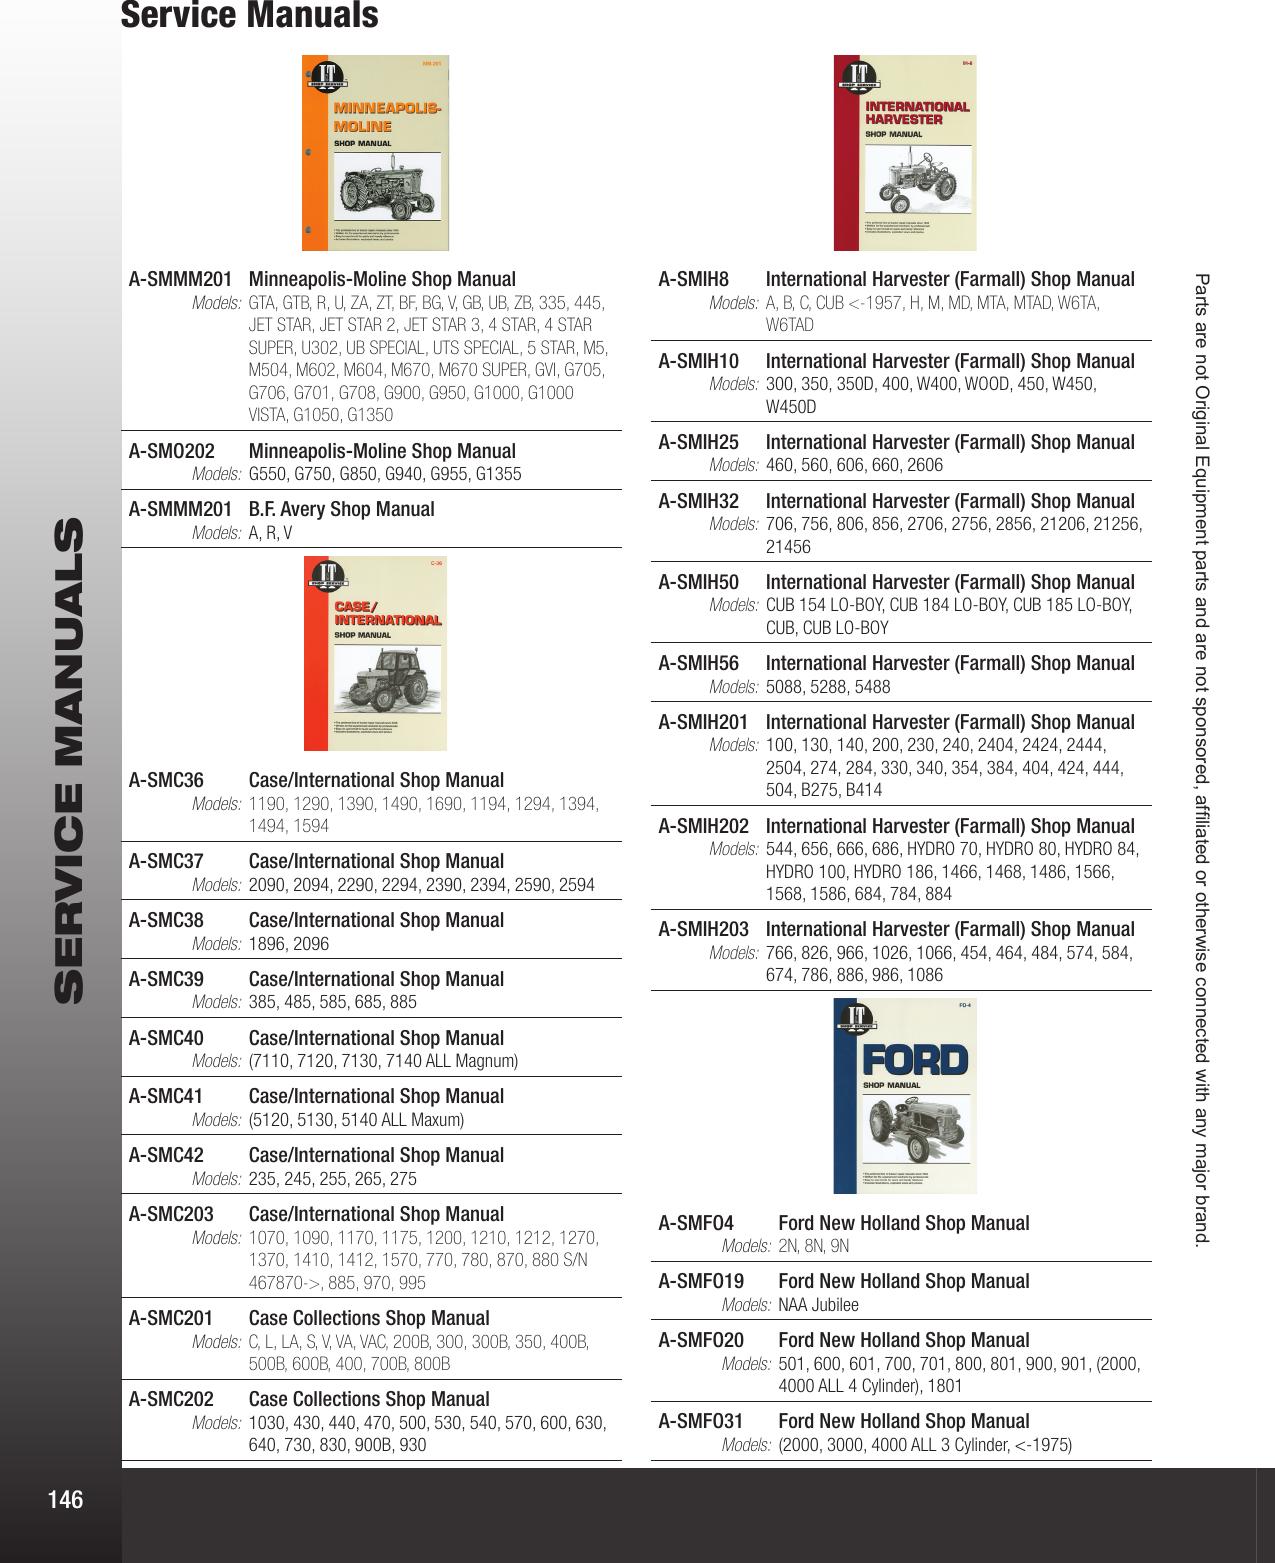 Farmall 656 Shop Manual Diagram And Parts List For Poulan Walkbehindlawnmowerparts Model Array Ag Supply Service Manuals Rh Usermanual Wiki